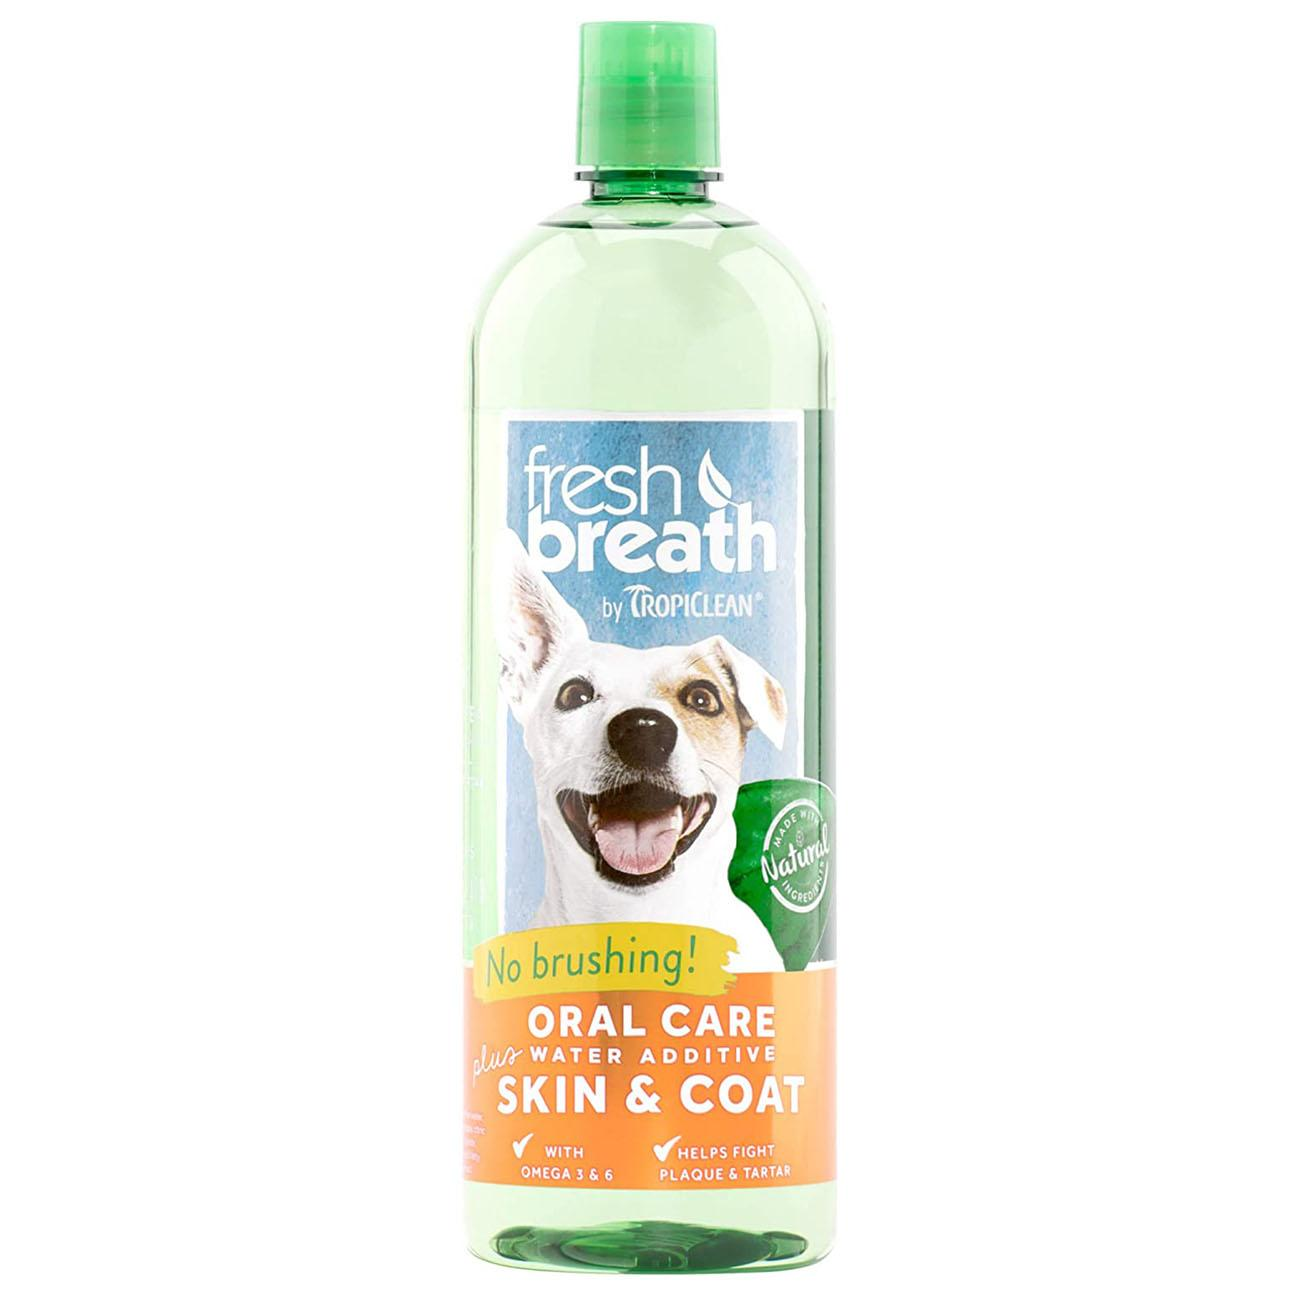 TropiClean Fresh Breath Pet Water Additive Plus - Skin & Coat